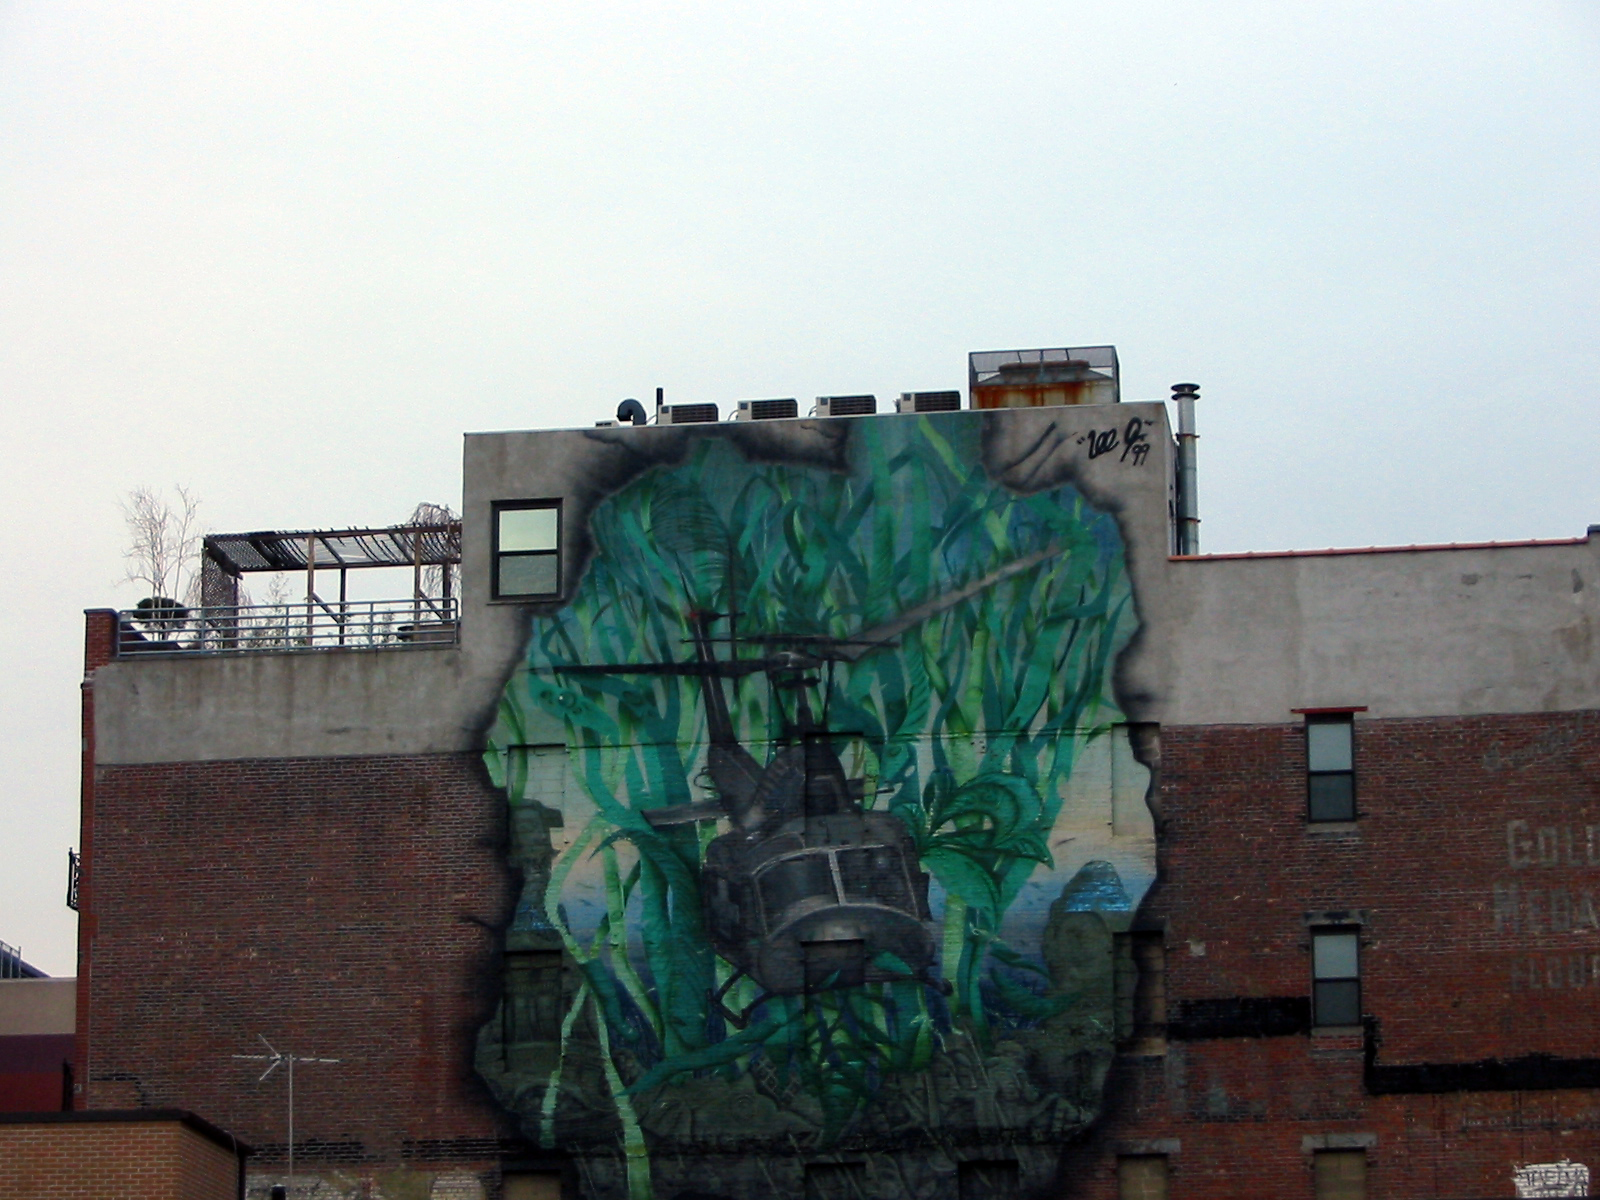 Allen Street, New York City